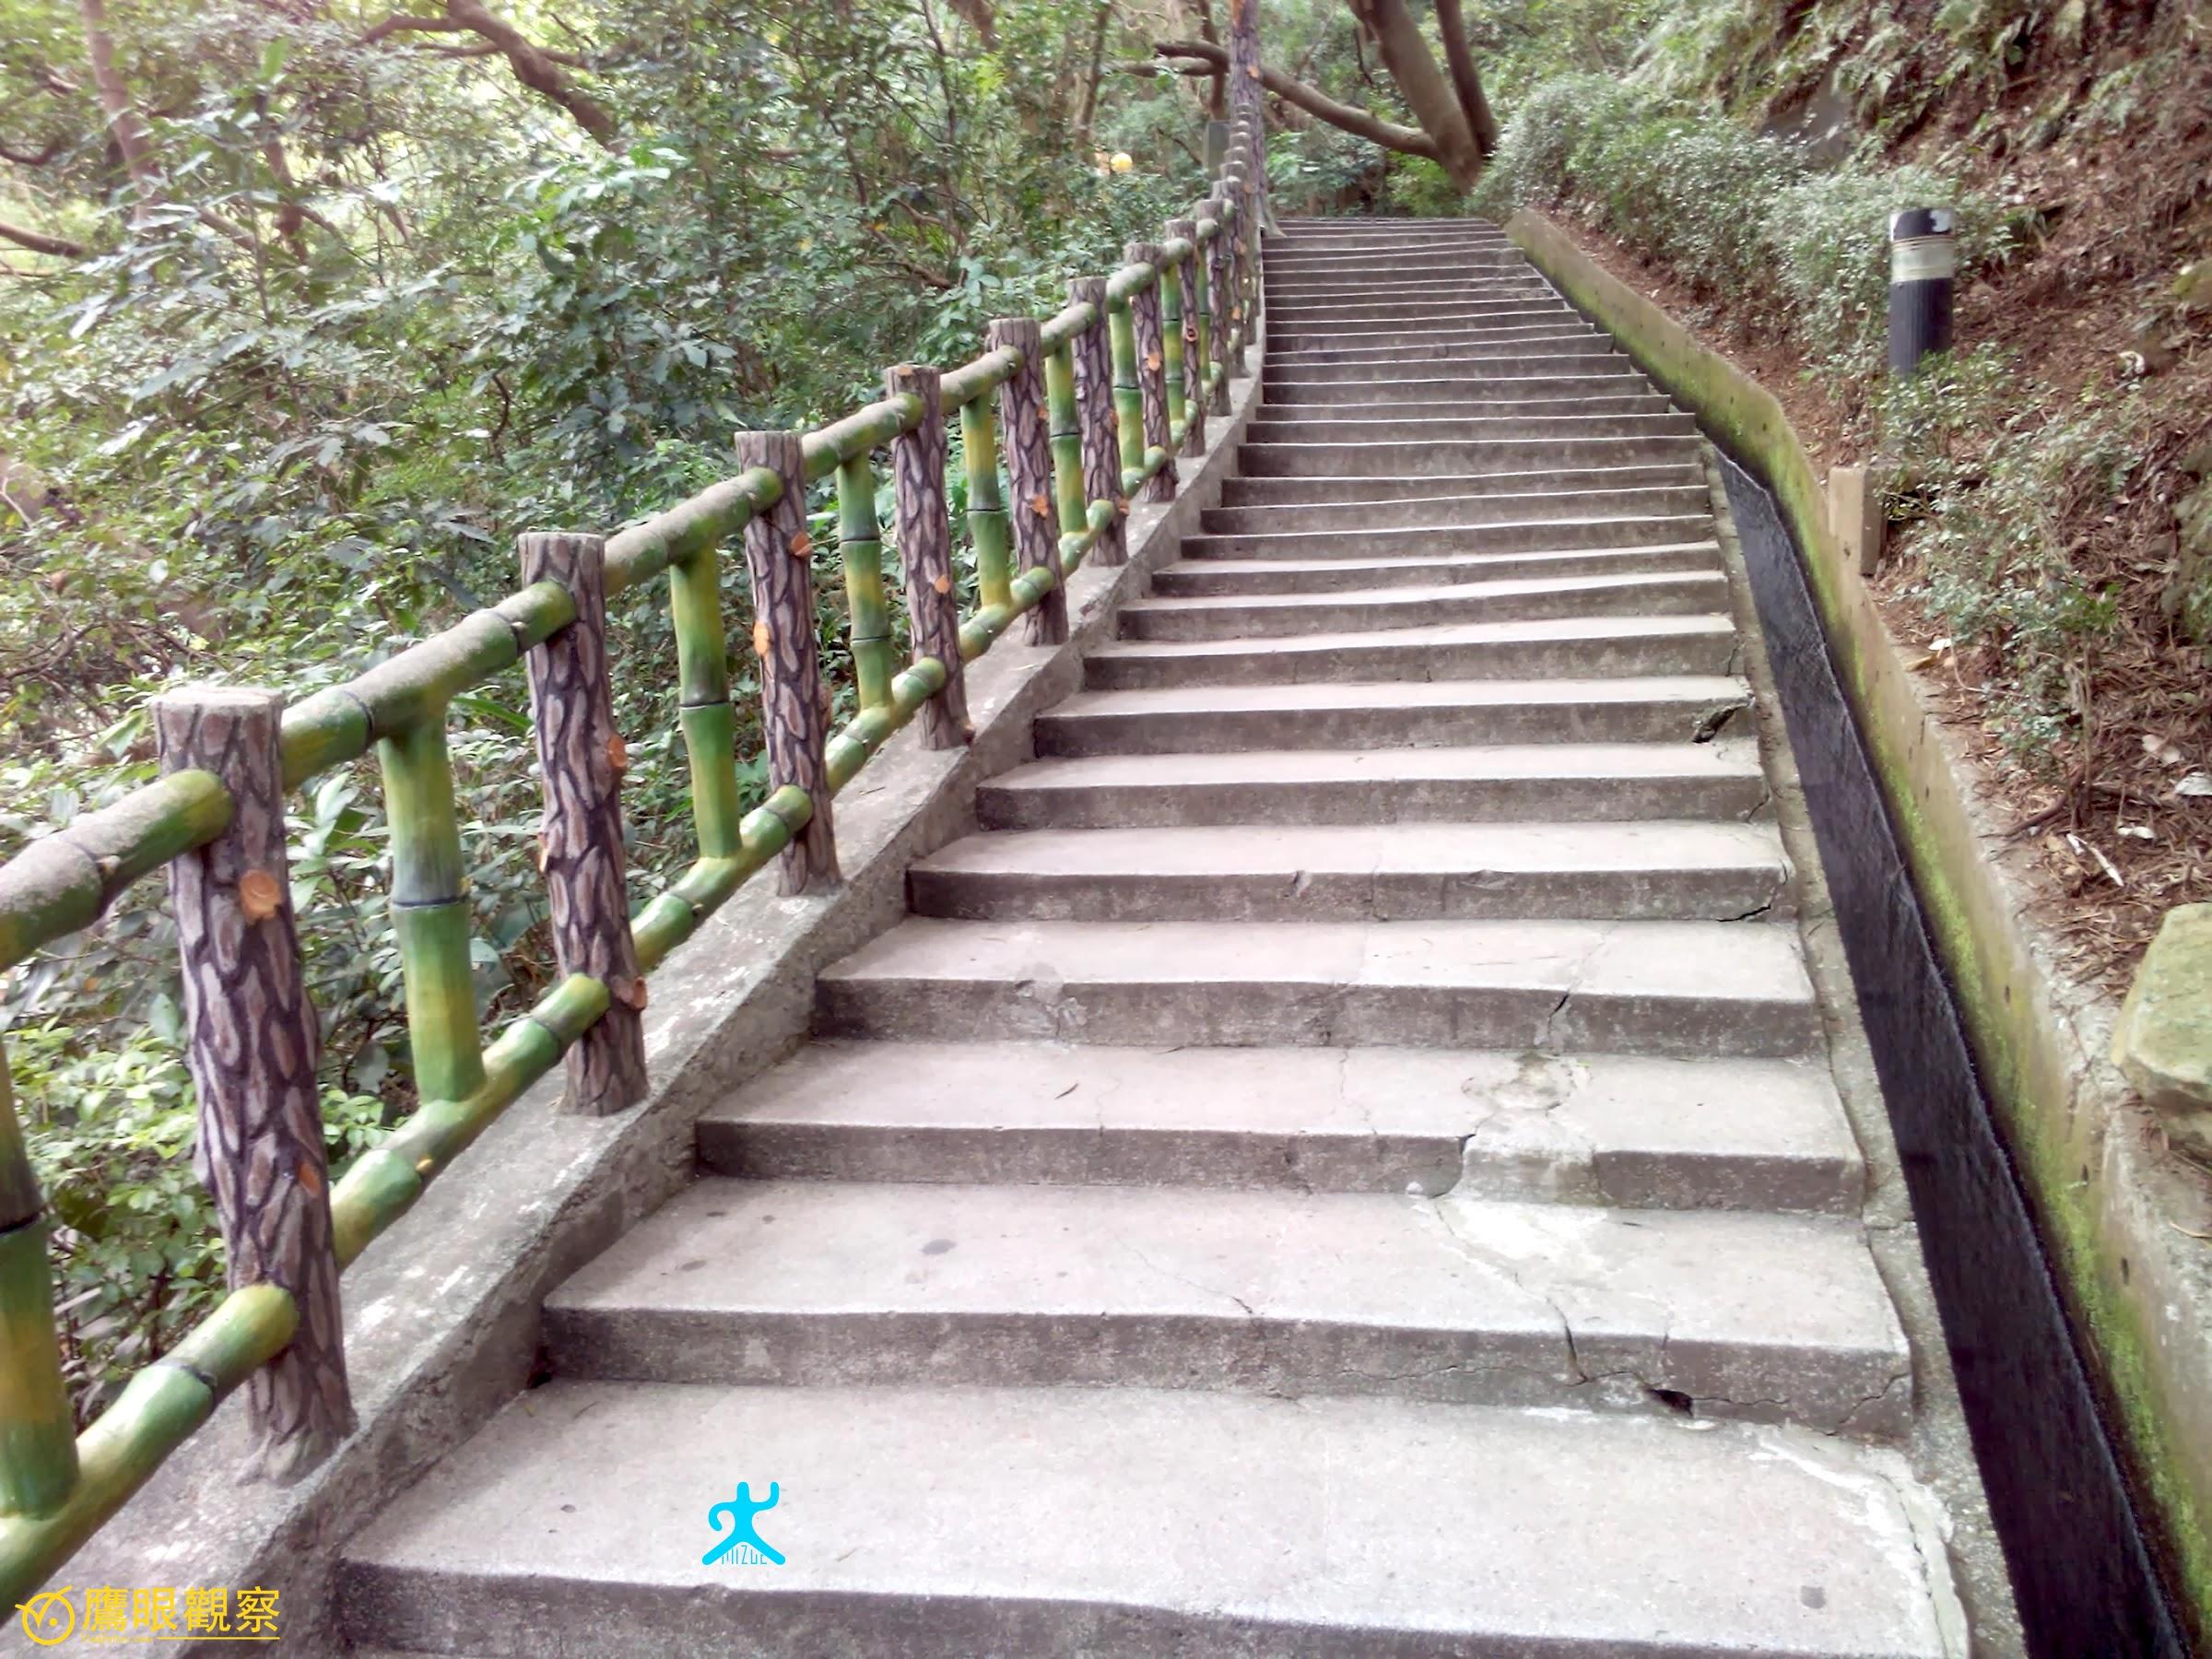 hot spring taipei beitou yangmingshan bathhouse tienhsiang 03 北投「天祥溫泉餐廳」台北泡湯的好地方